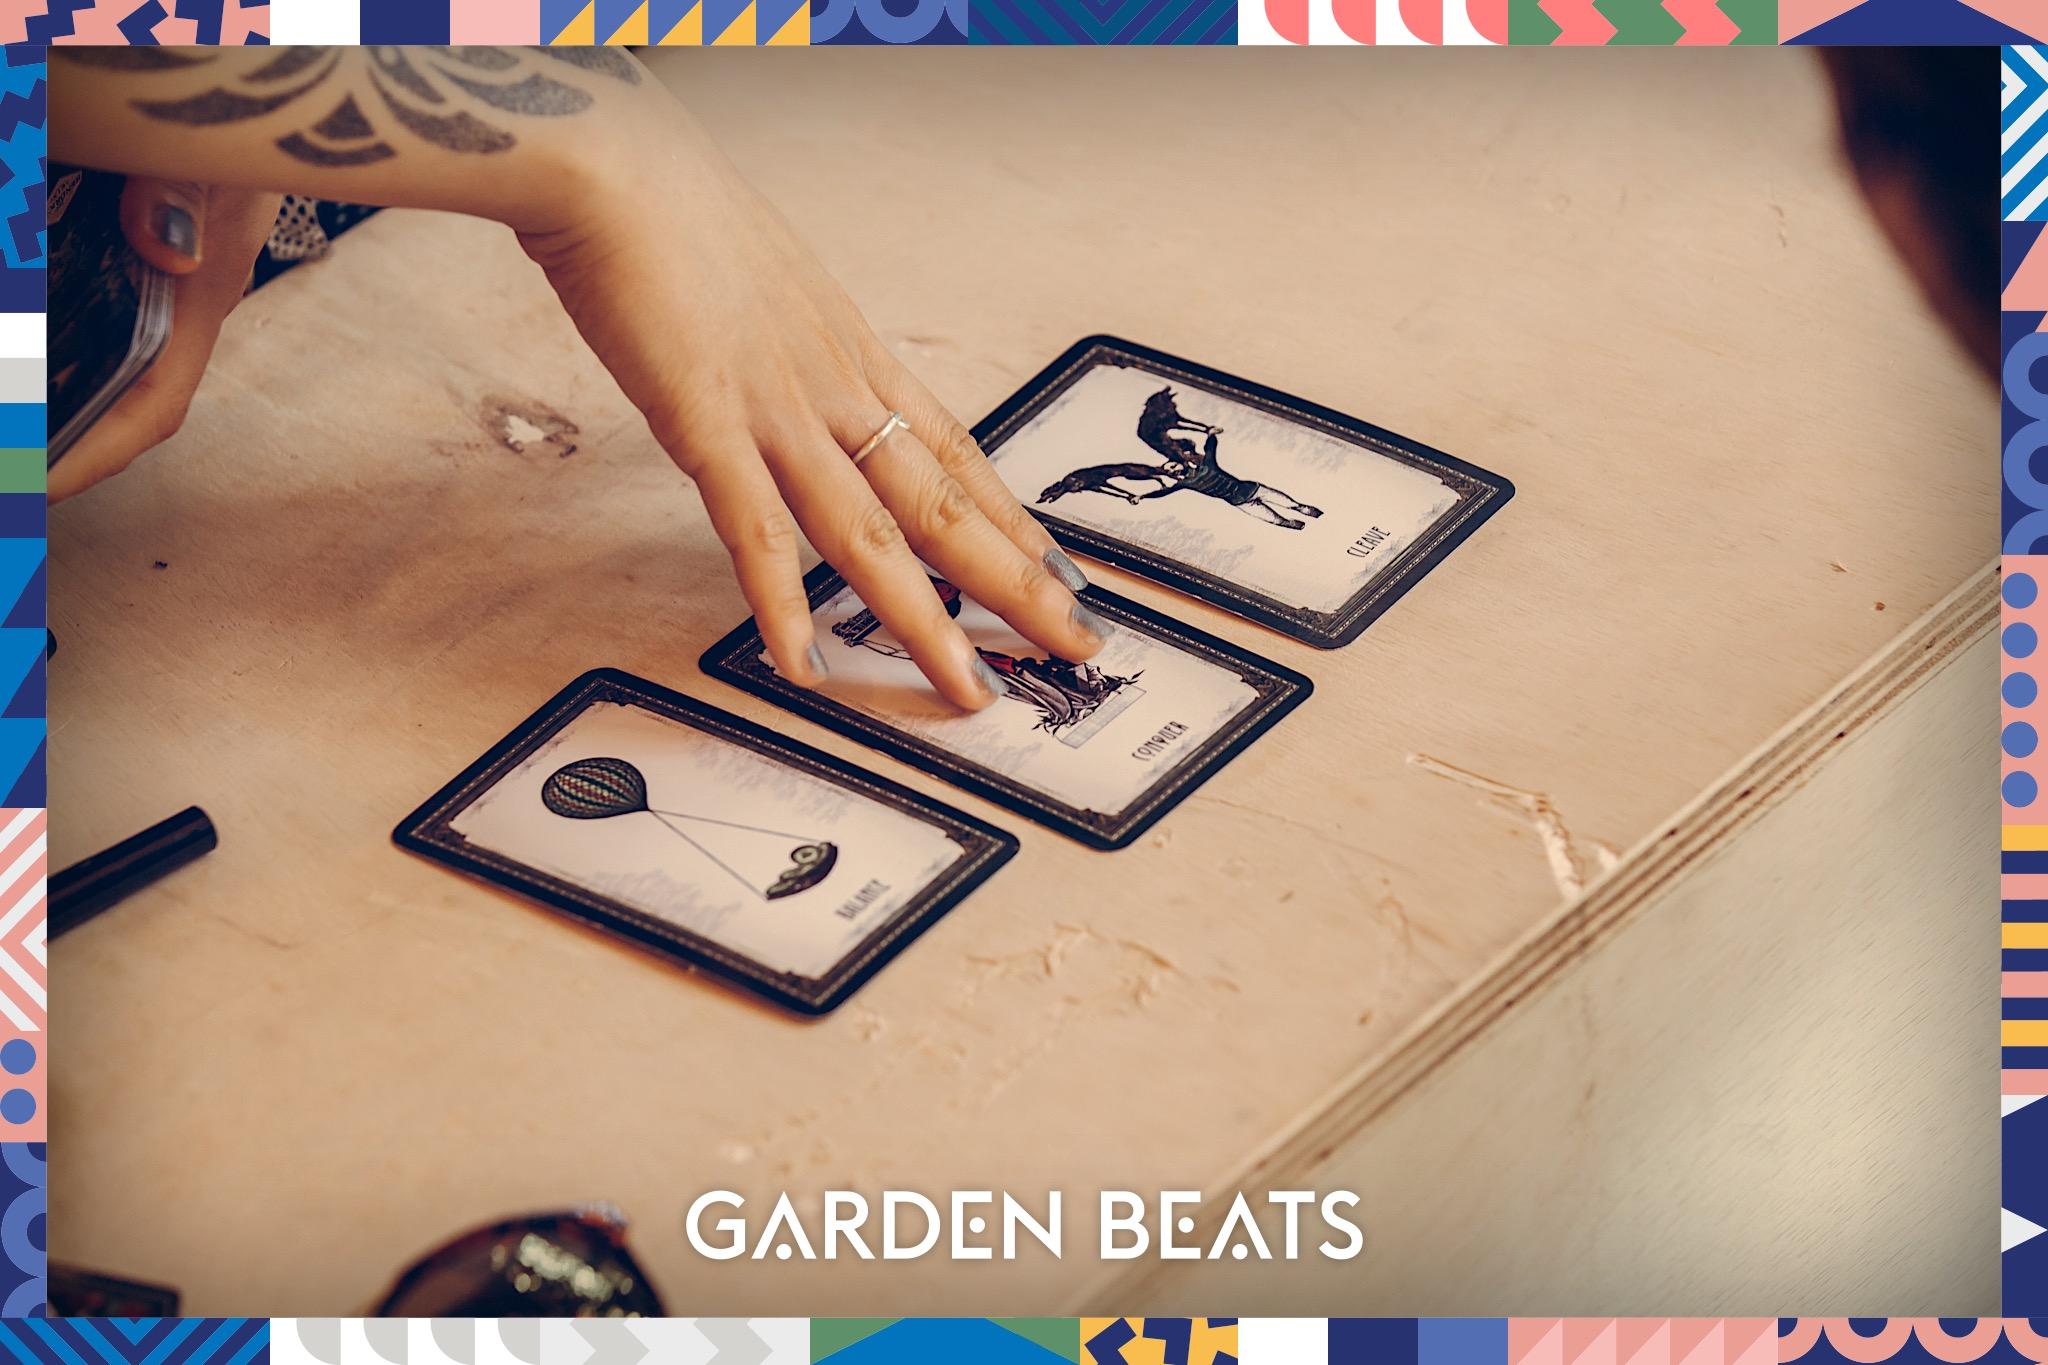 03032018_GardenBeats_Colossal188_Watermarked.jpg